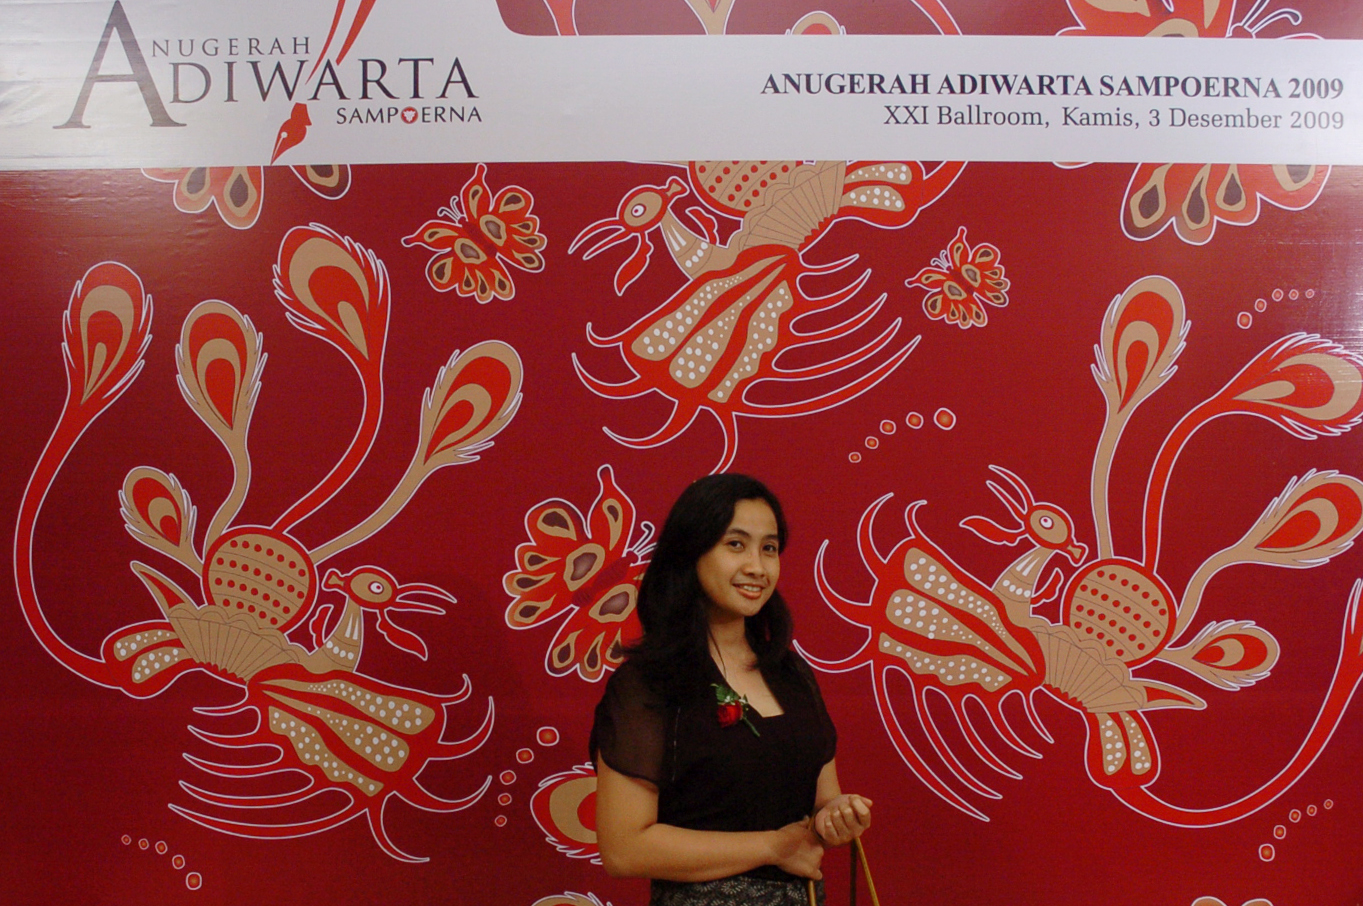 www.anugerahadiwarta.org